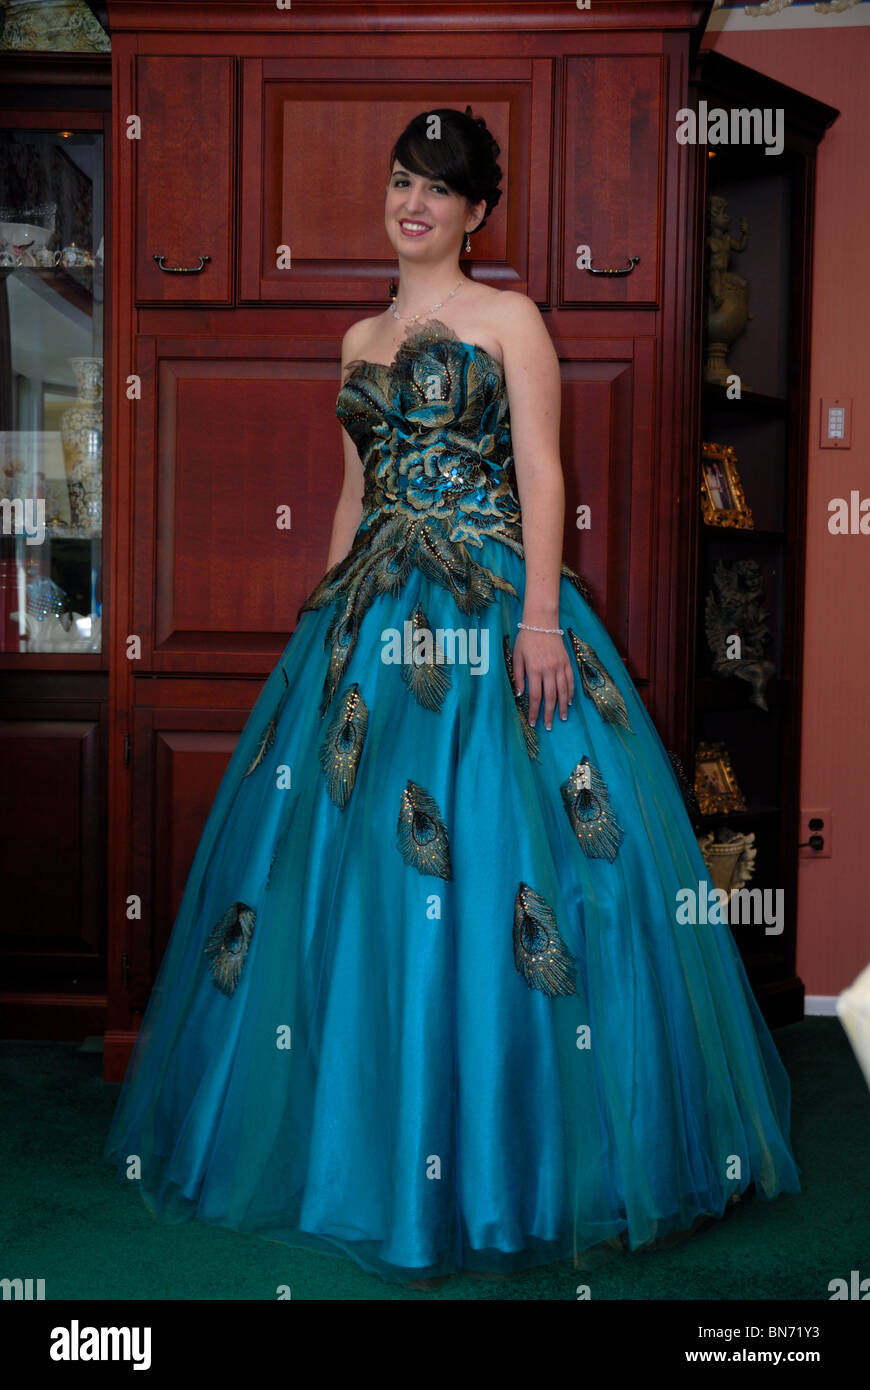 A teenager in a beautiful aqua colored prom dress in an elegant ...